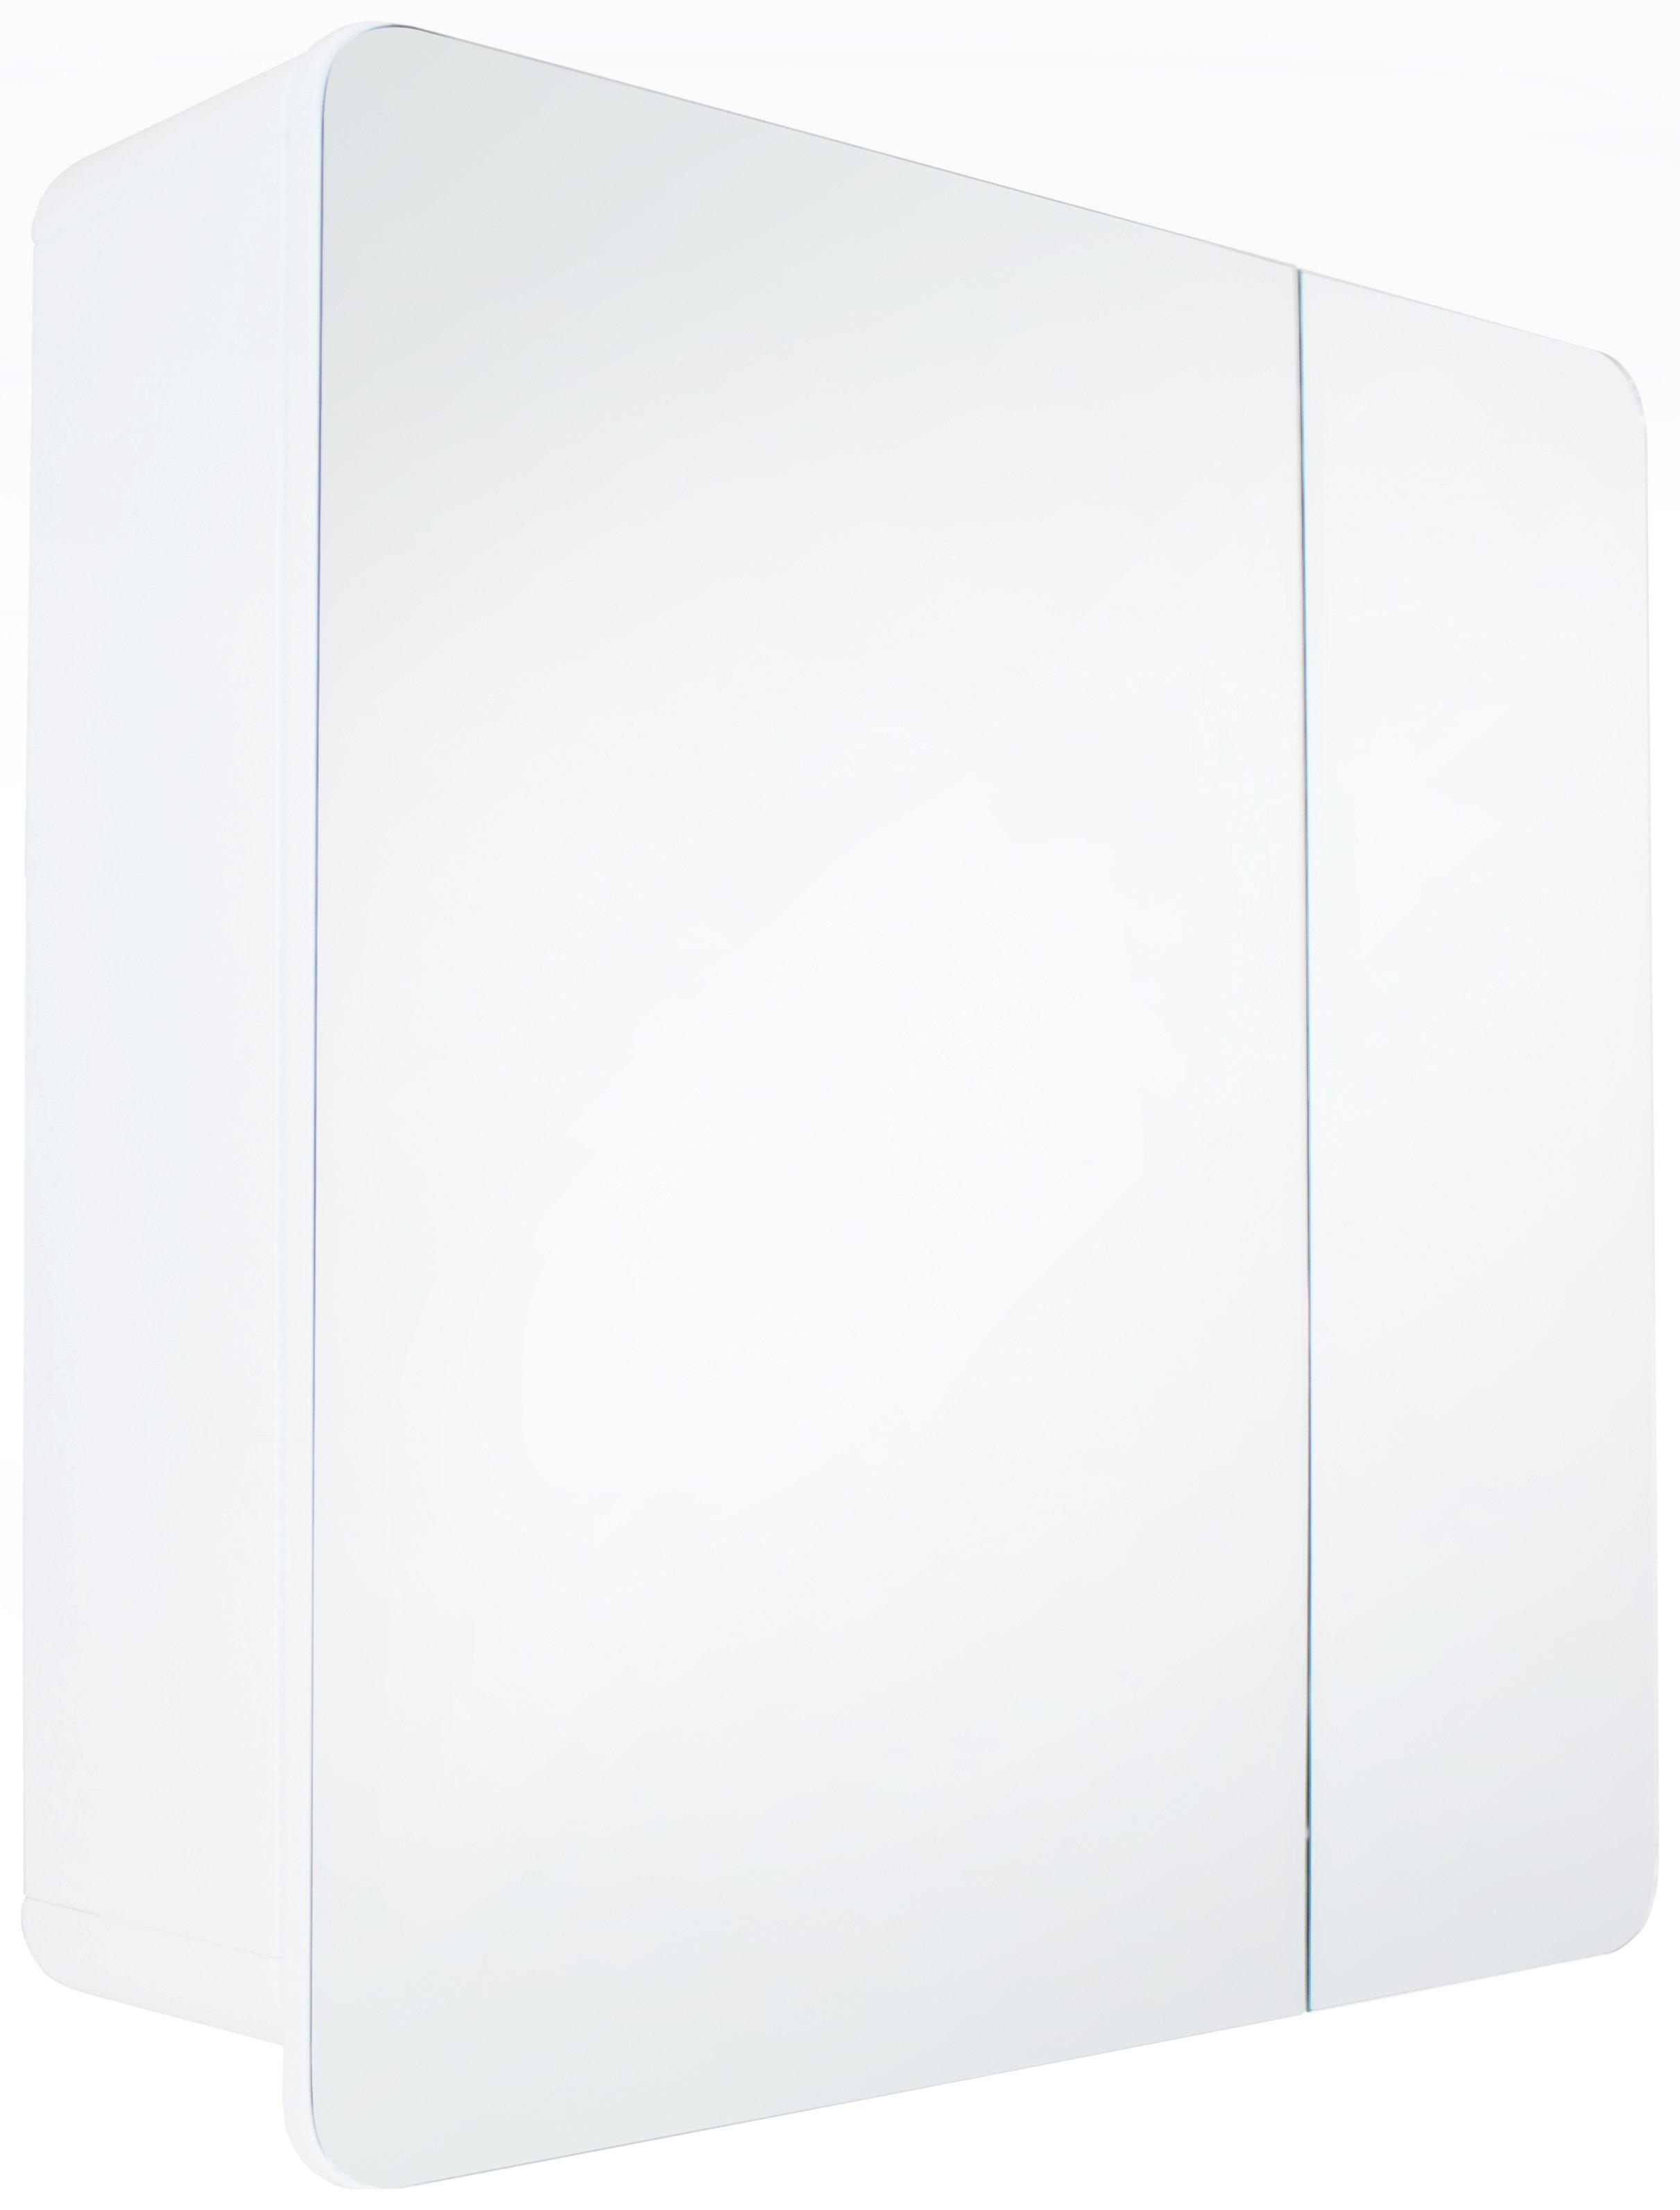 Hygena Curve Double Door Mirrored Bathroom Cabinet   White